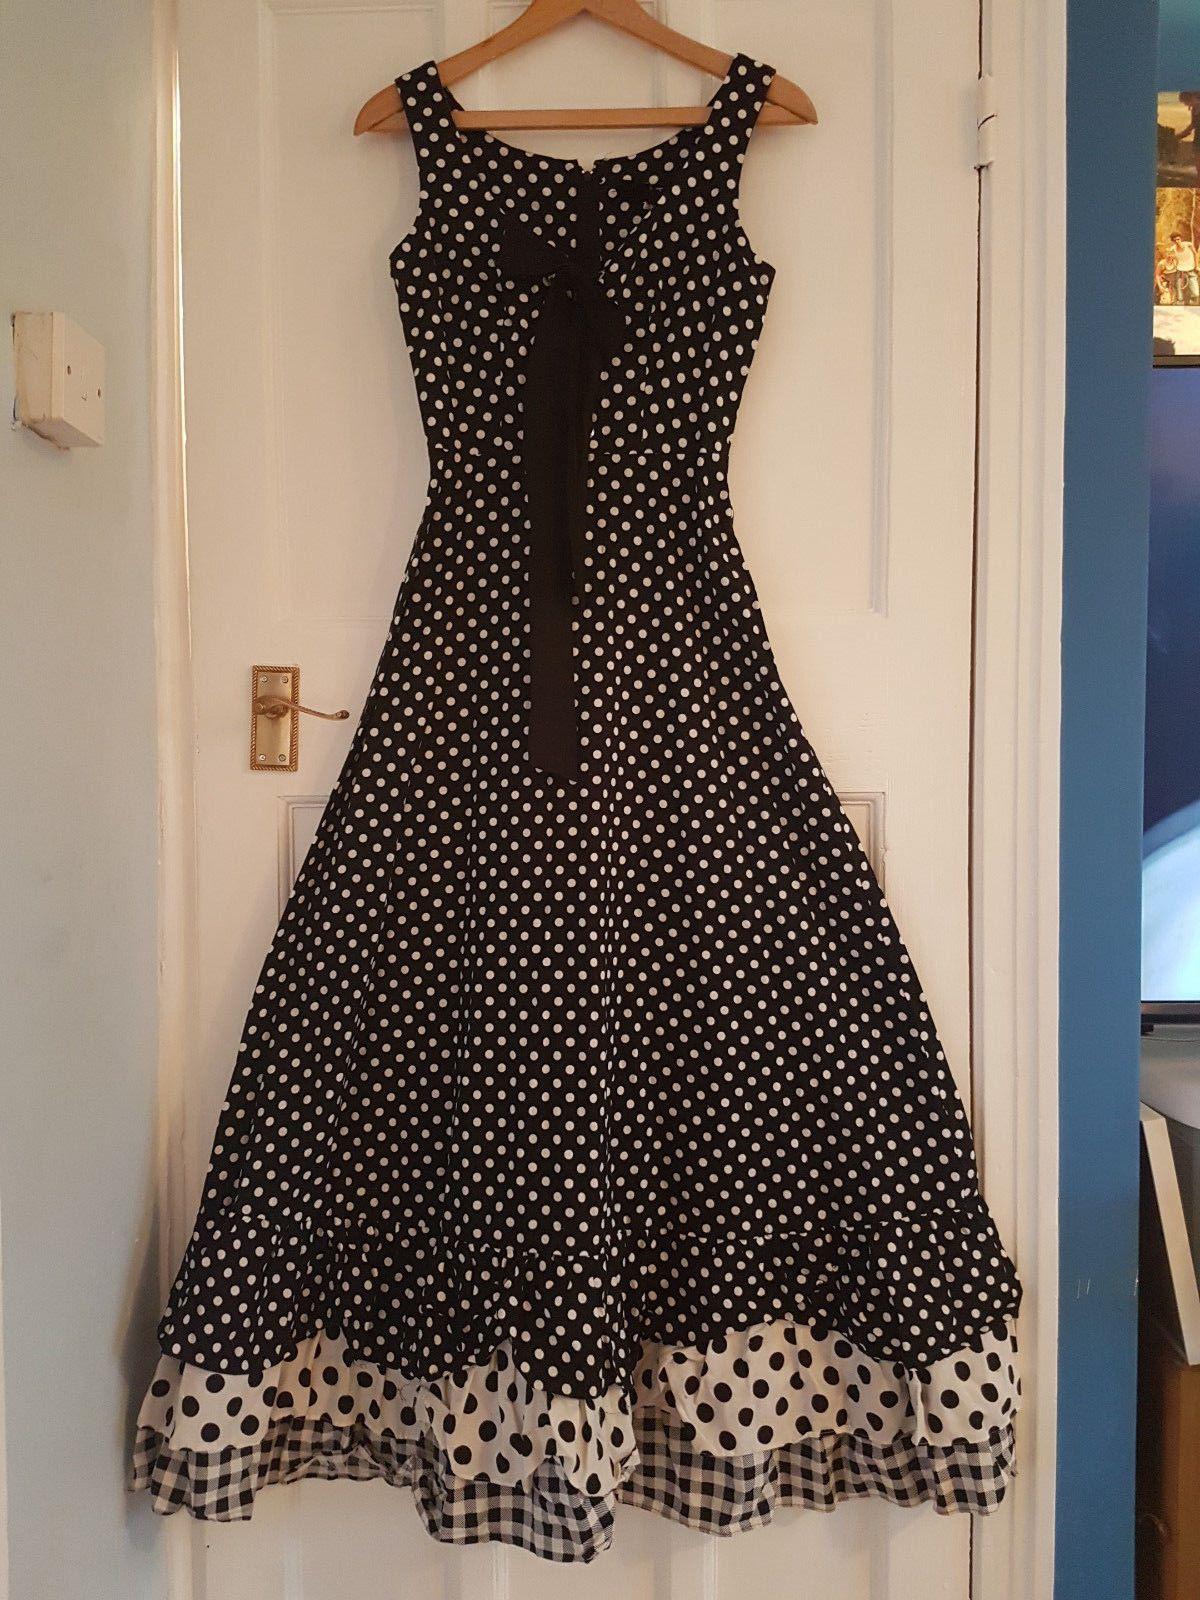 Vintage corset front winchester london maxi dress boho hippy prairie